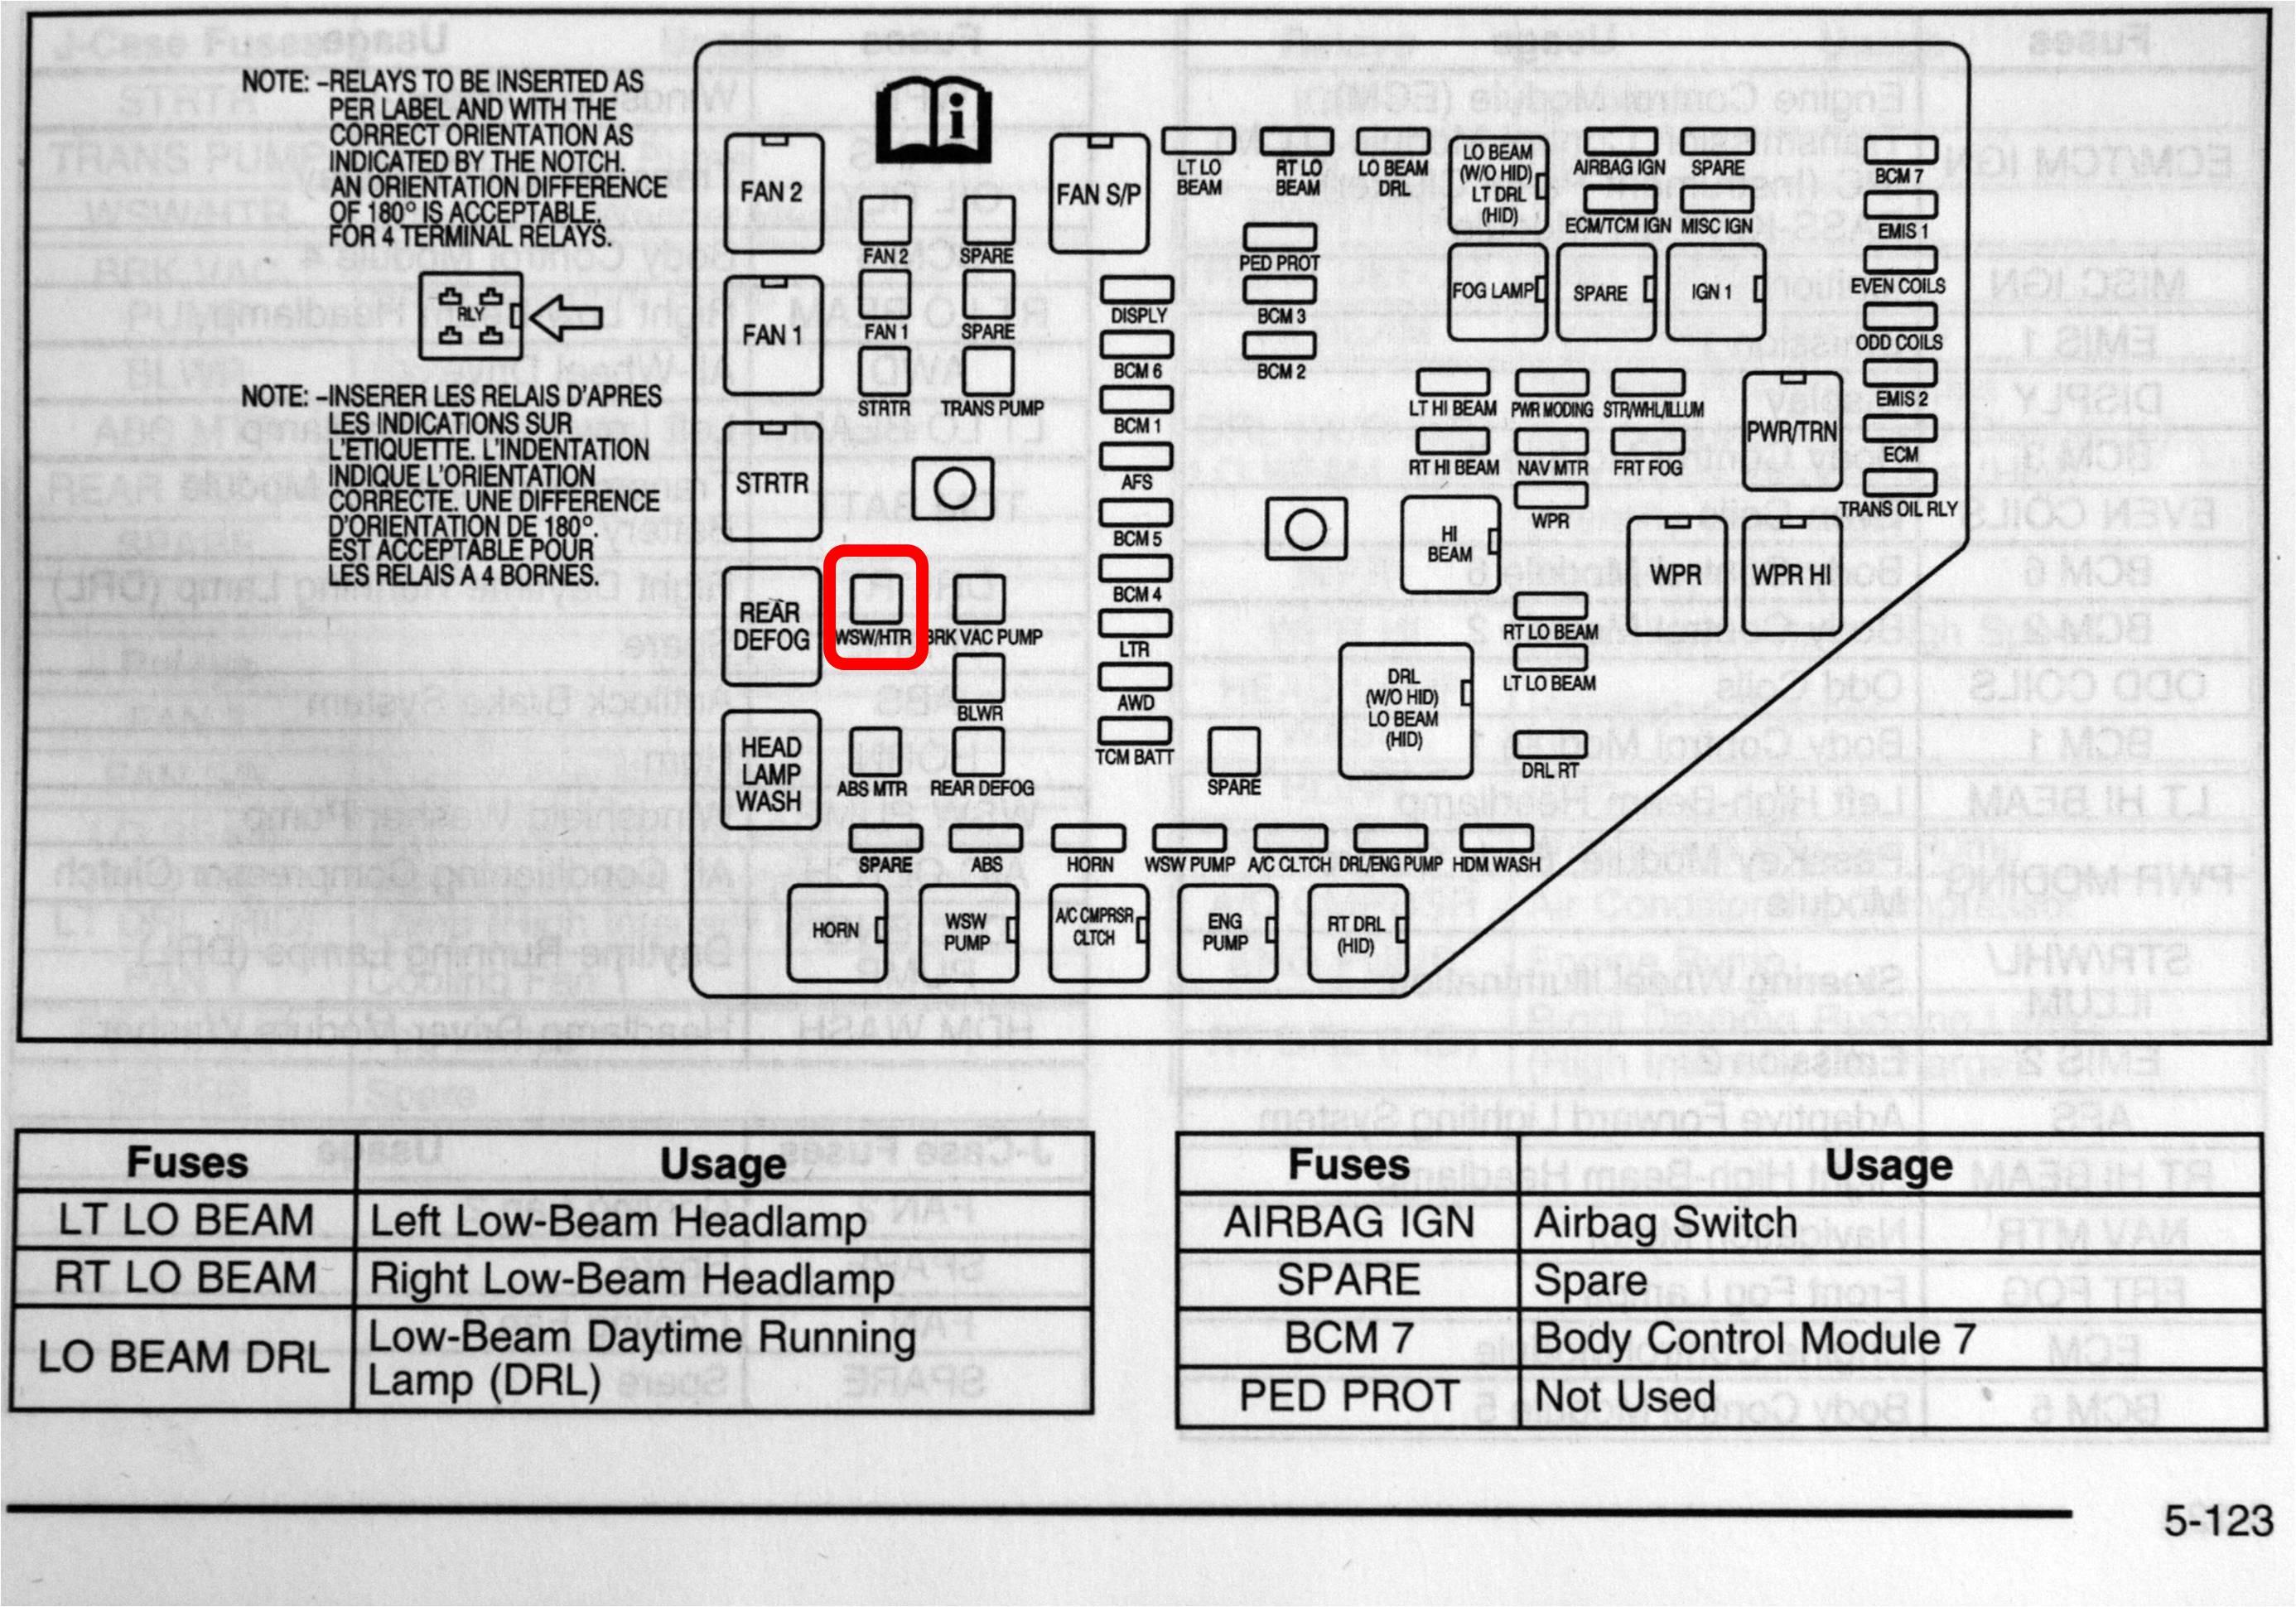 suzuki swift 1999 fuse box - 4 wire trailer wiring diagram how to fix up -  viking.nikotin2.jeanjaures37.fr  wiring diagram resource